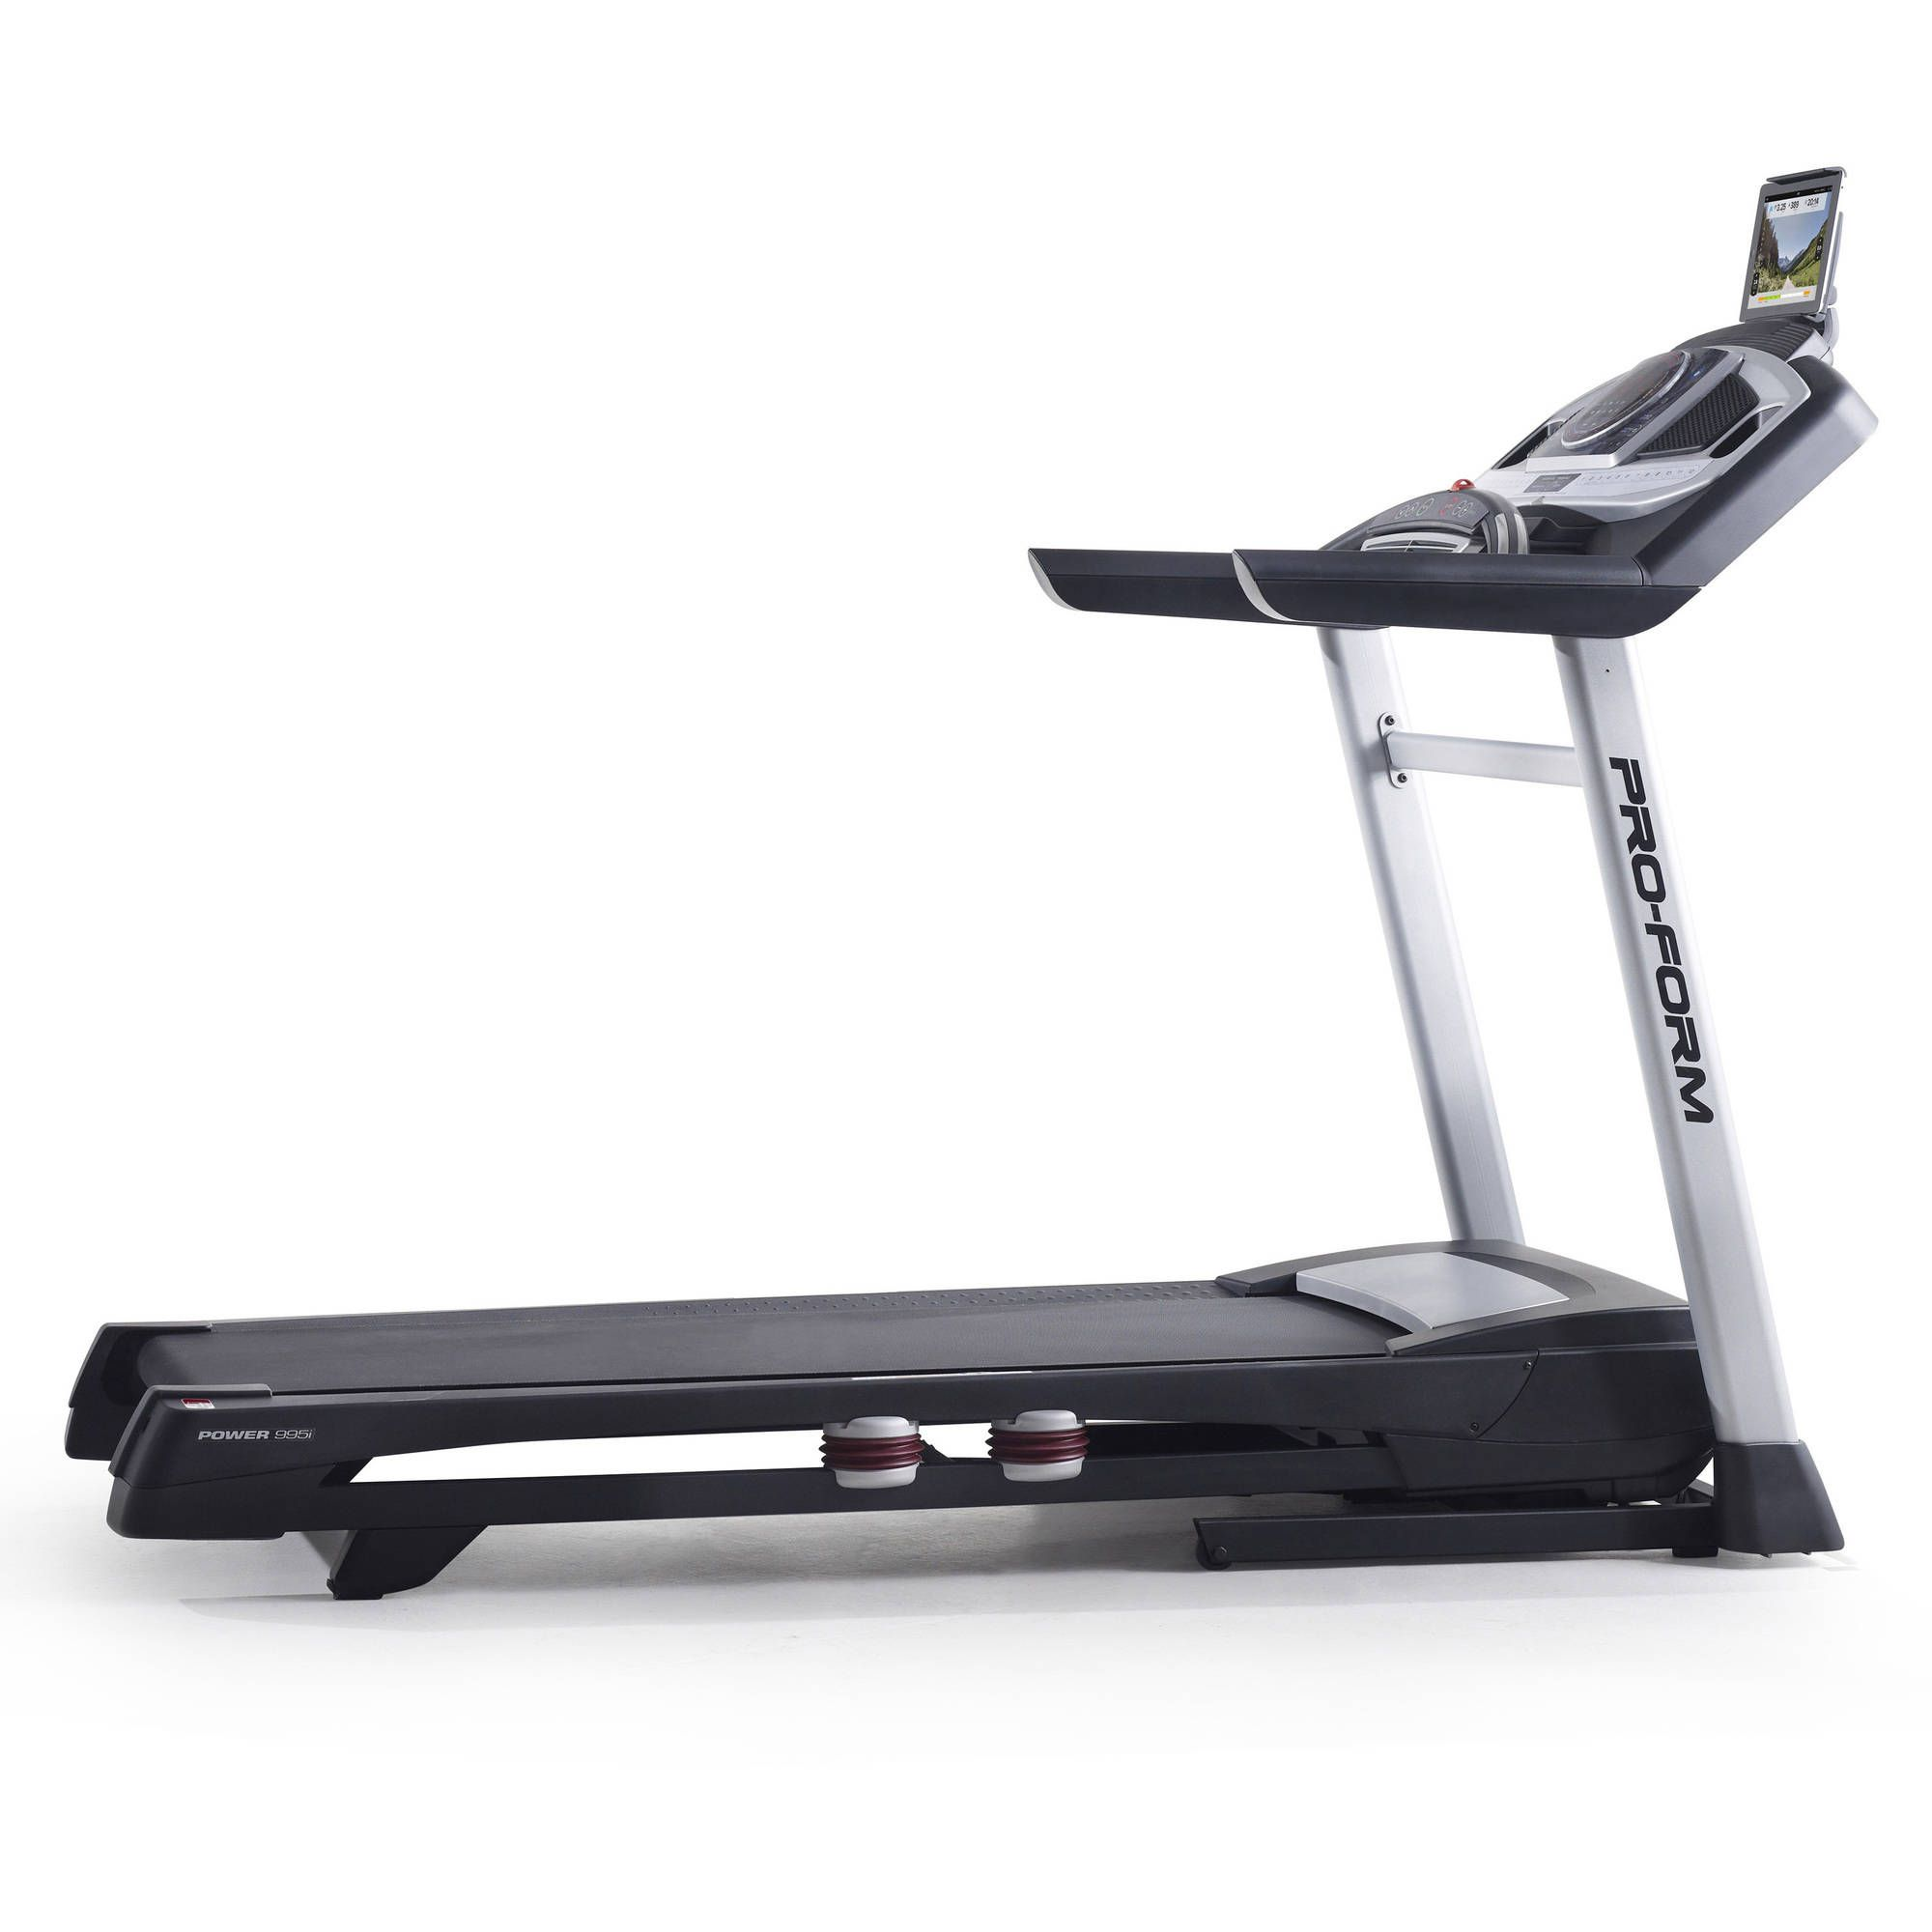 Save Big on This Treadmill at Walmart